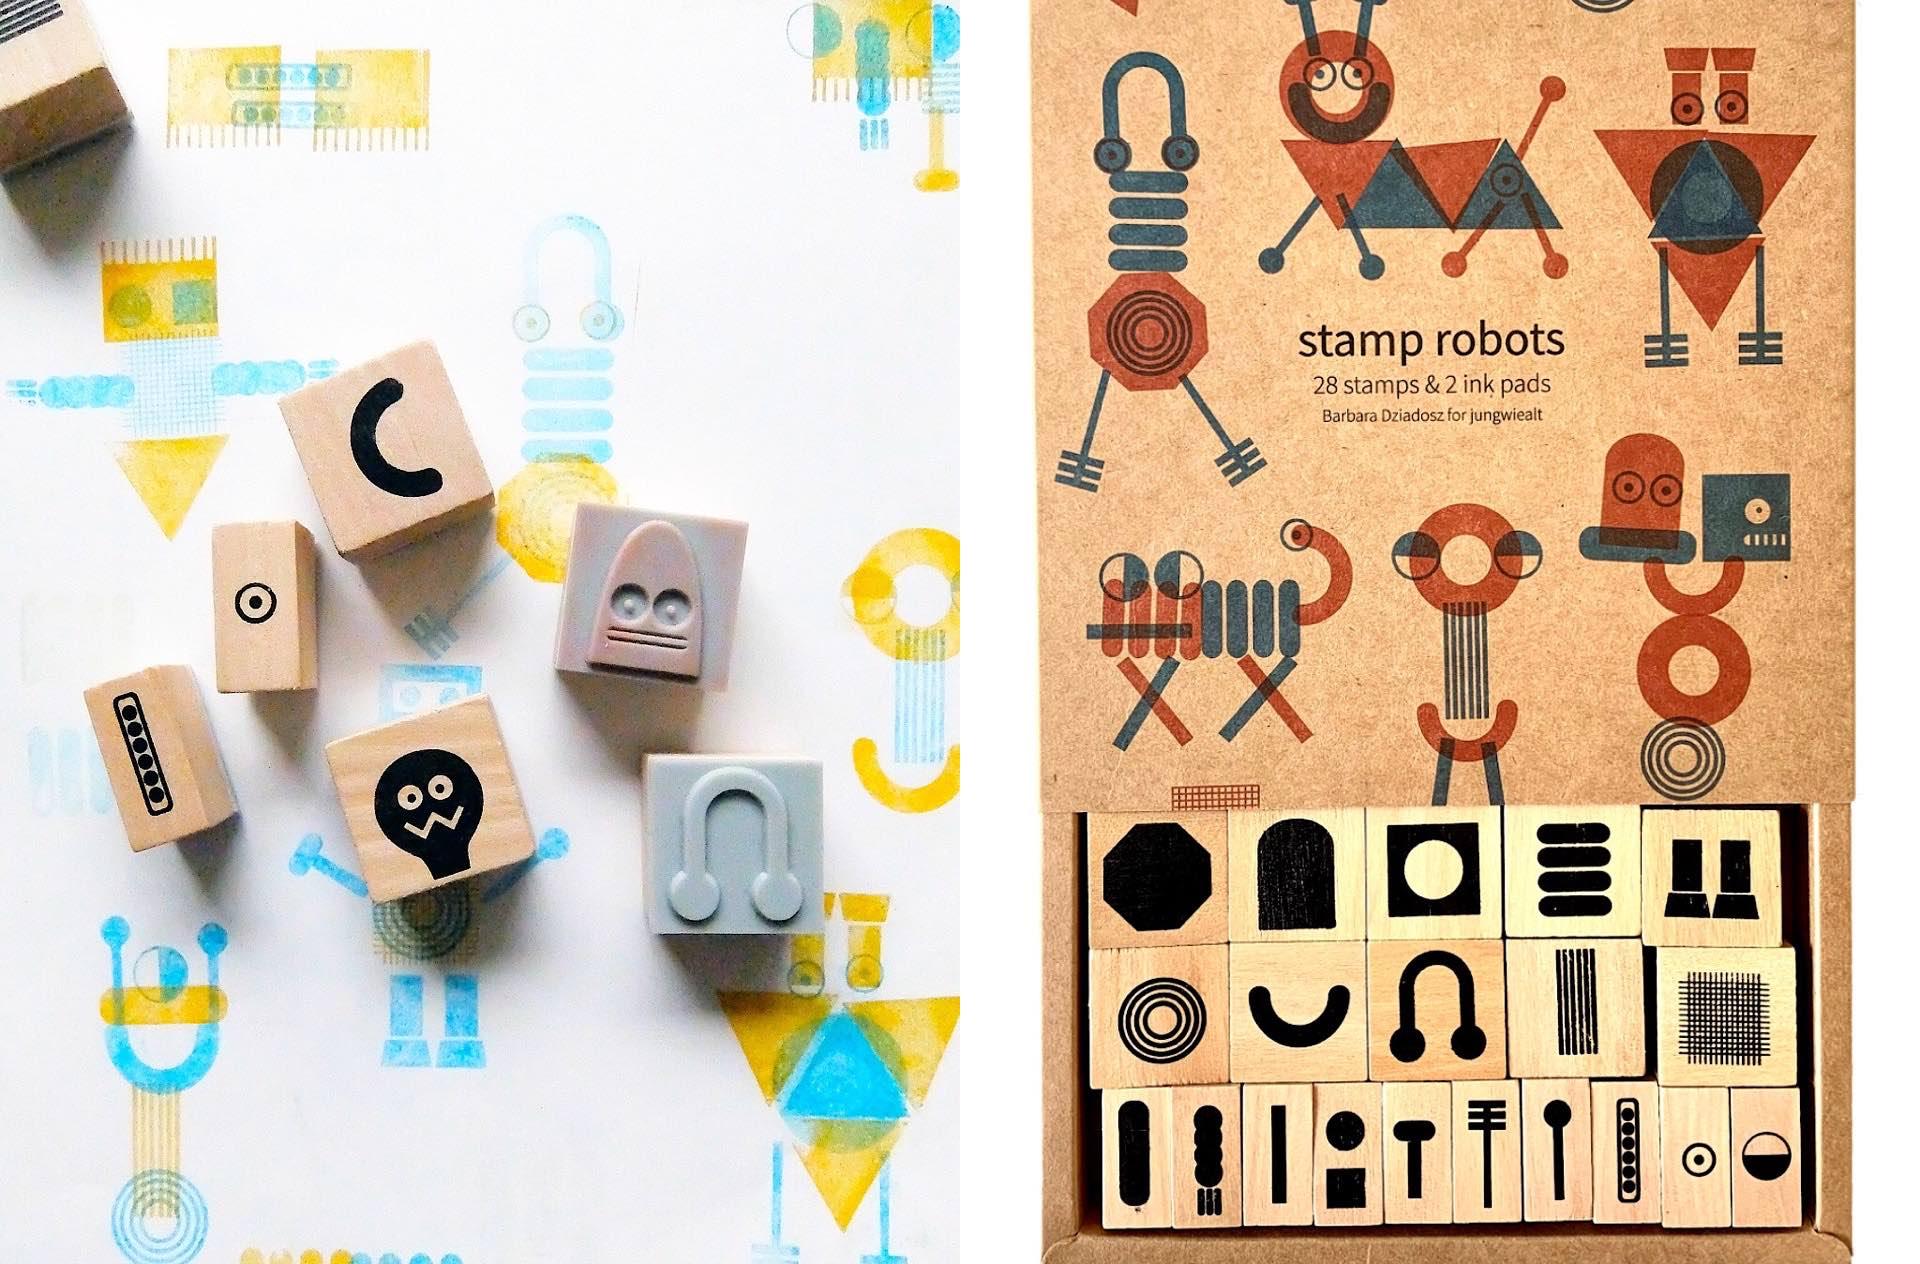 jungwiealt-robot-stamps